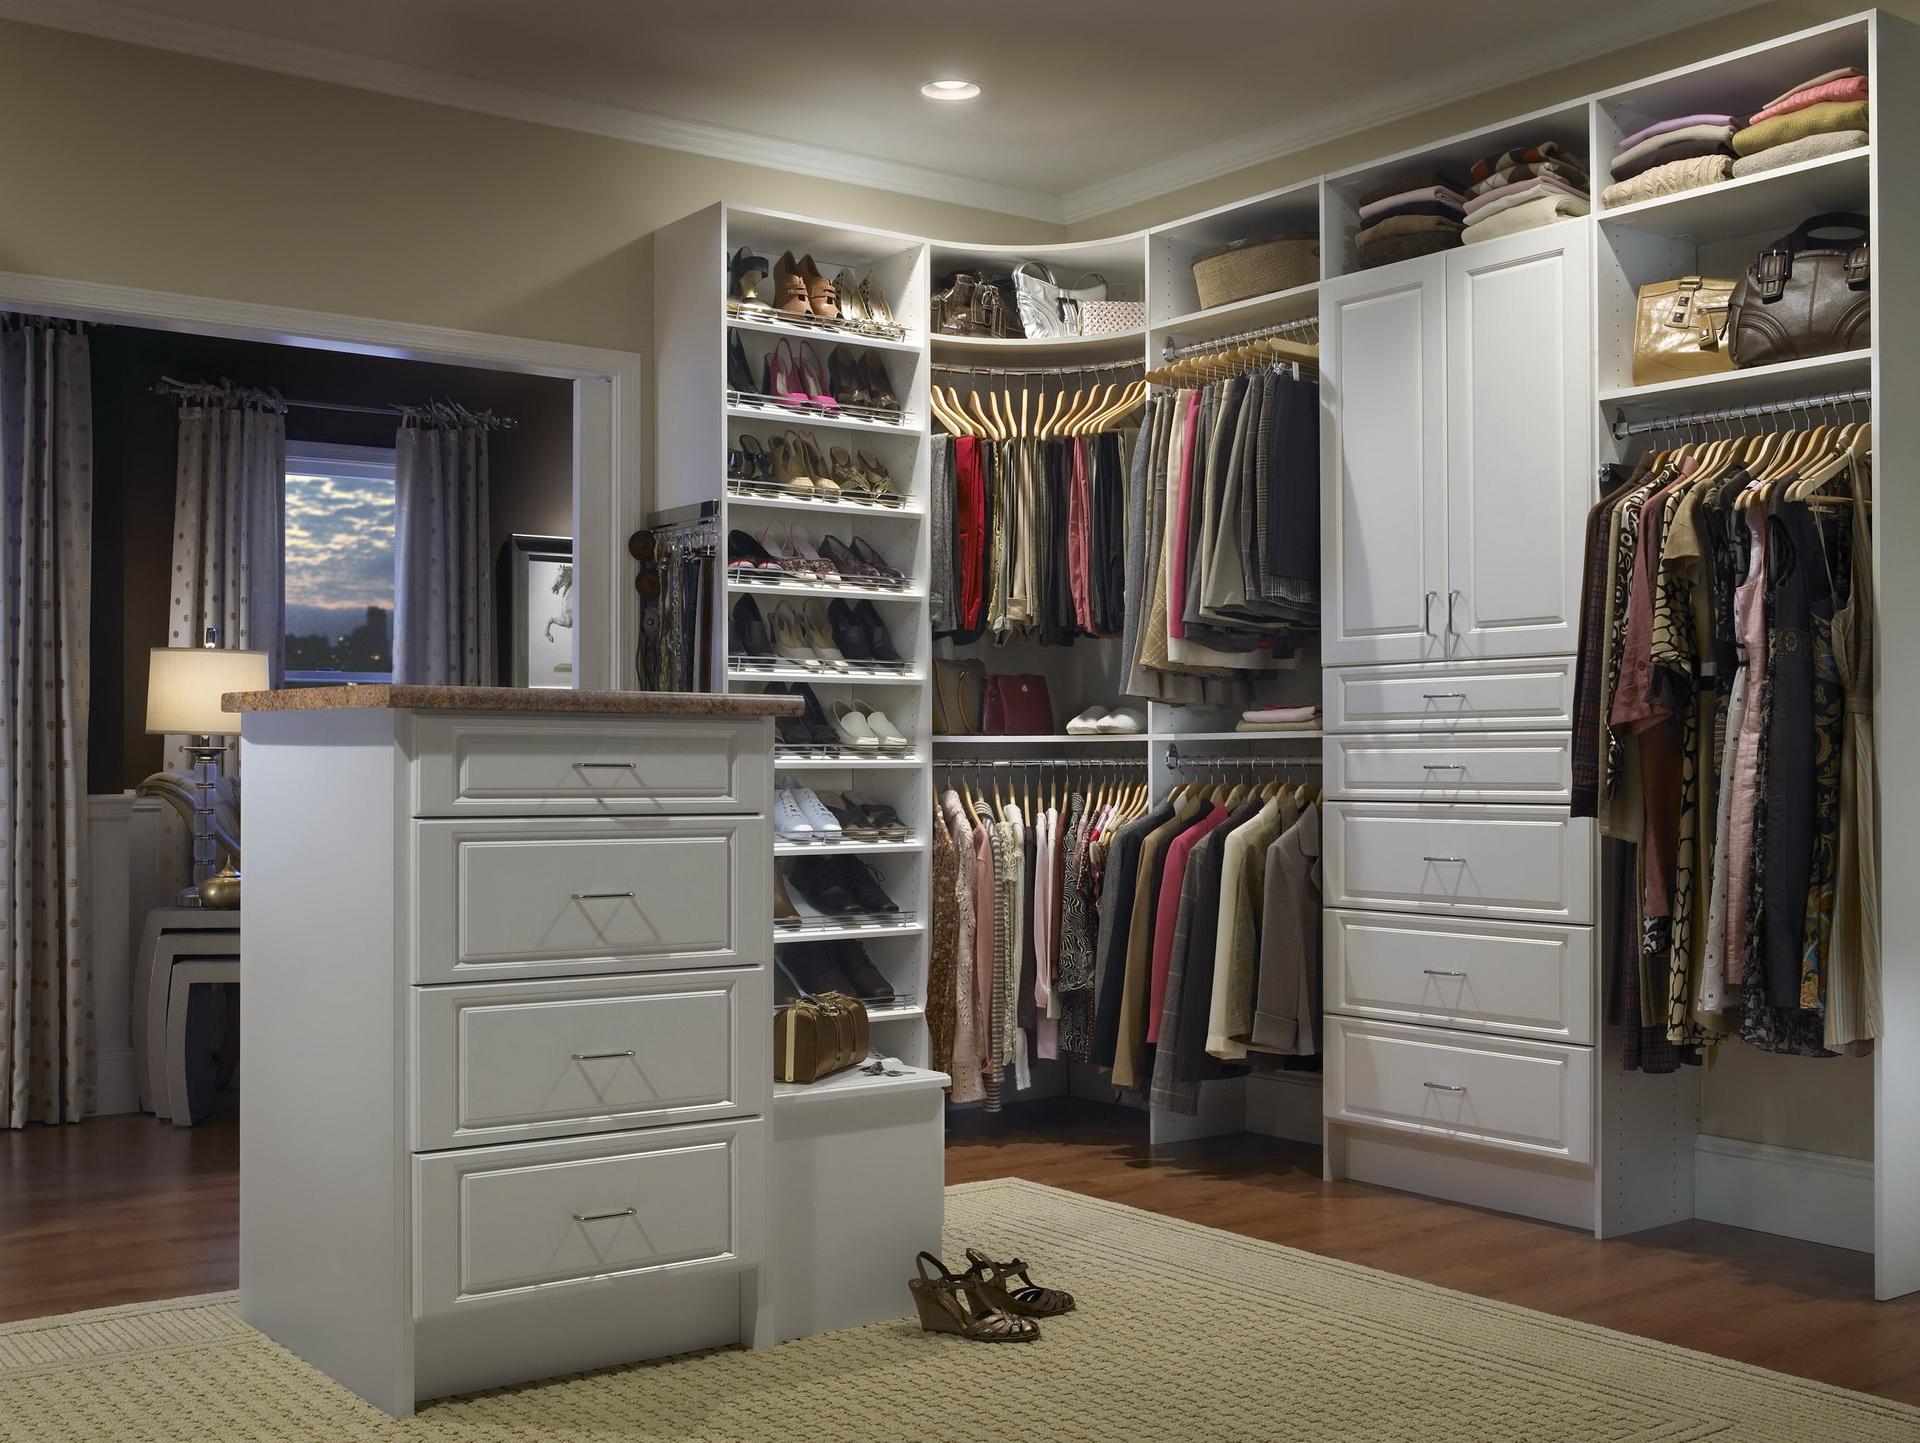 walk-in-closet-designs-plans-photo-9